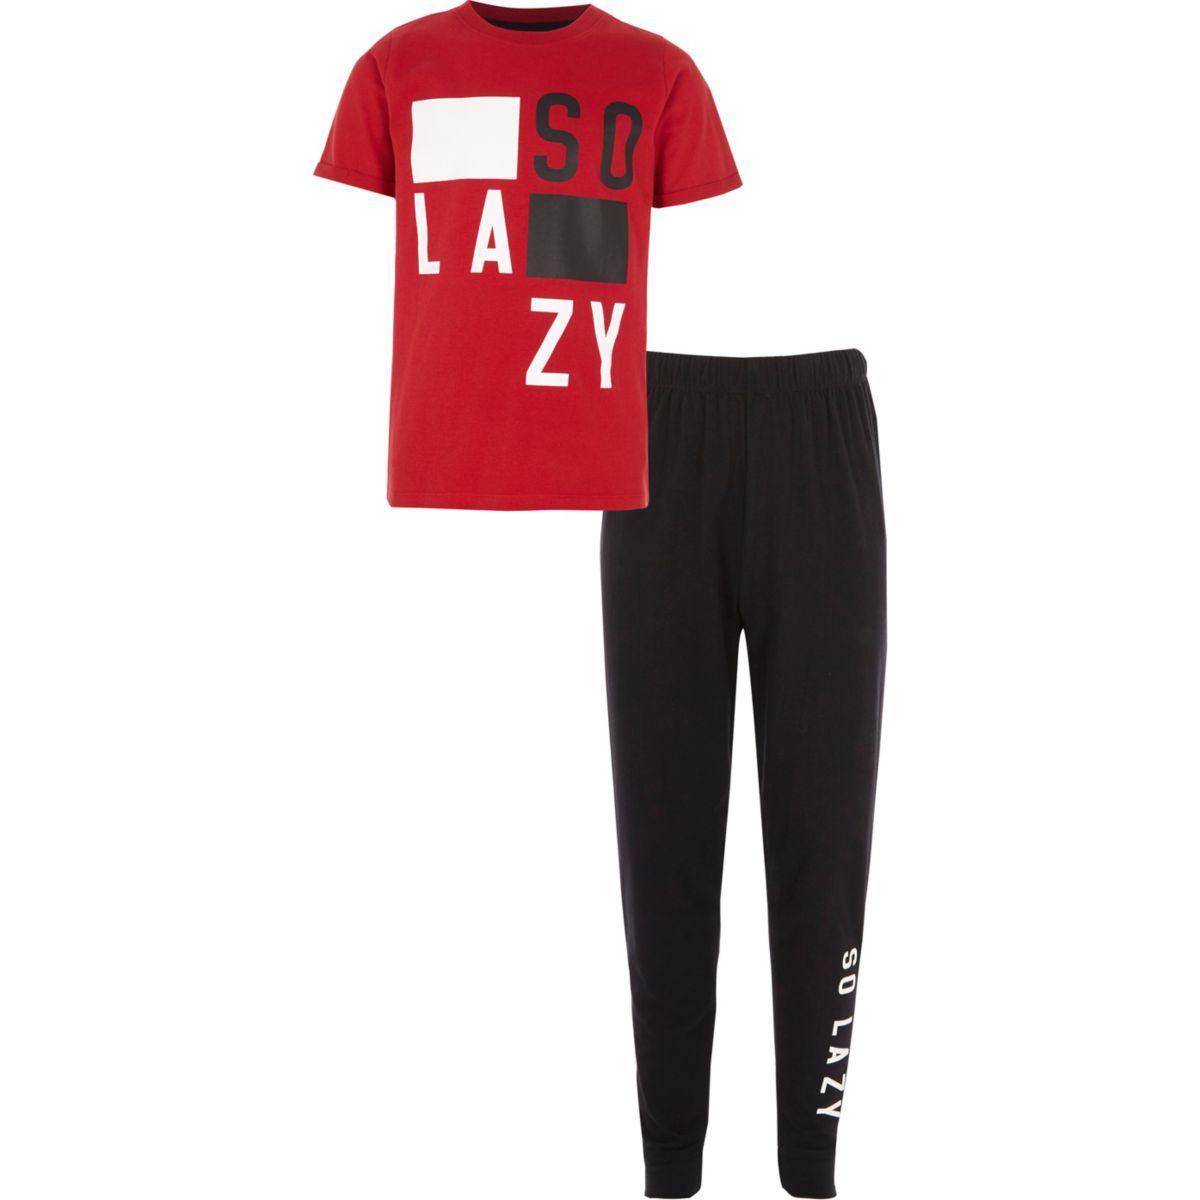 Boys red 'so lazy' pajama set